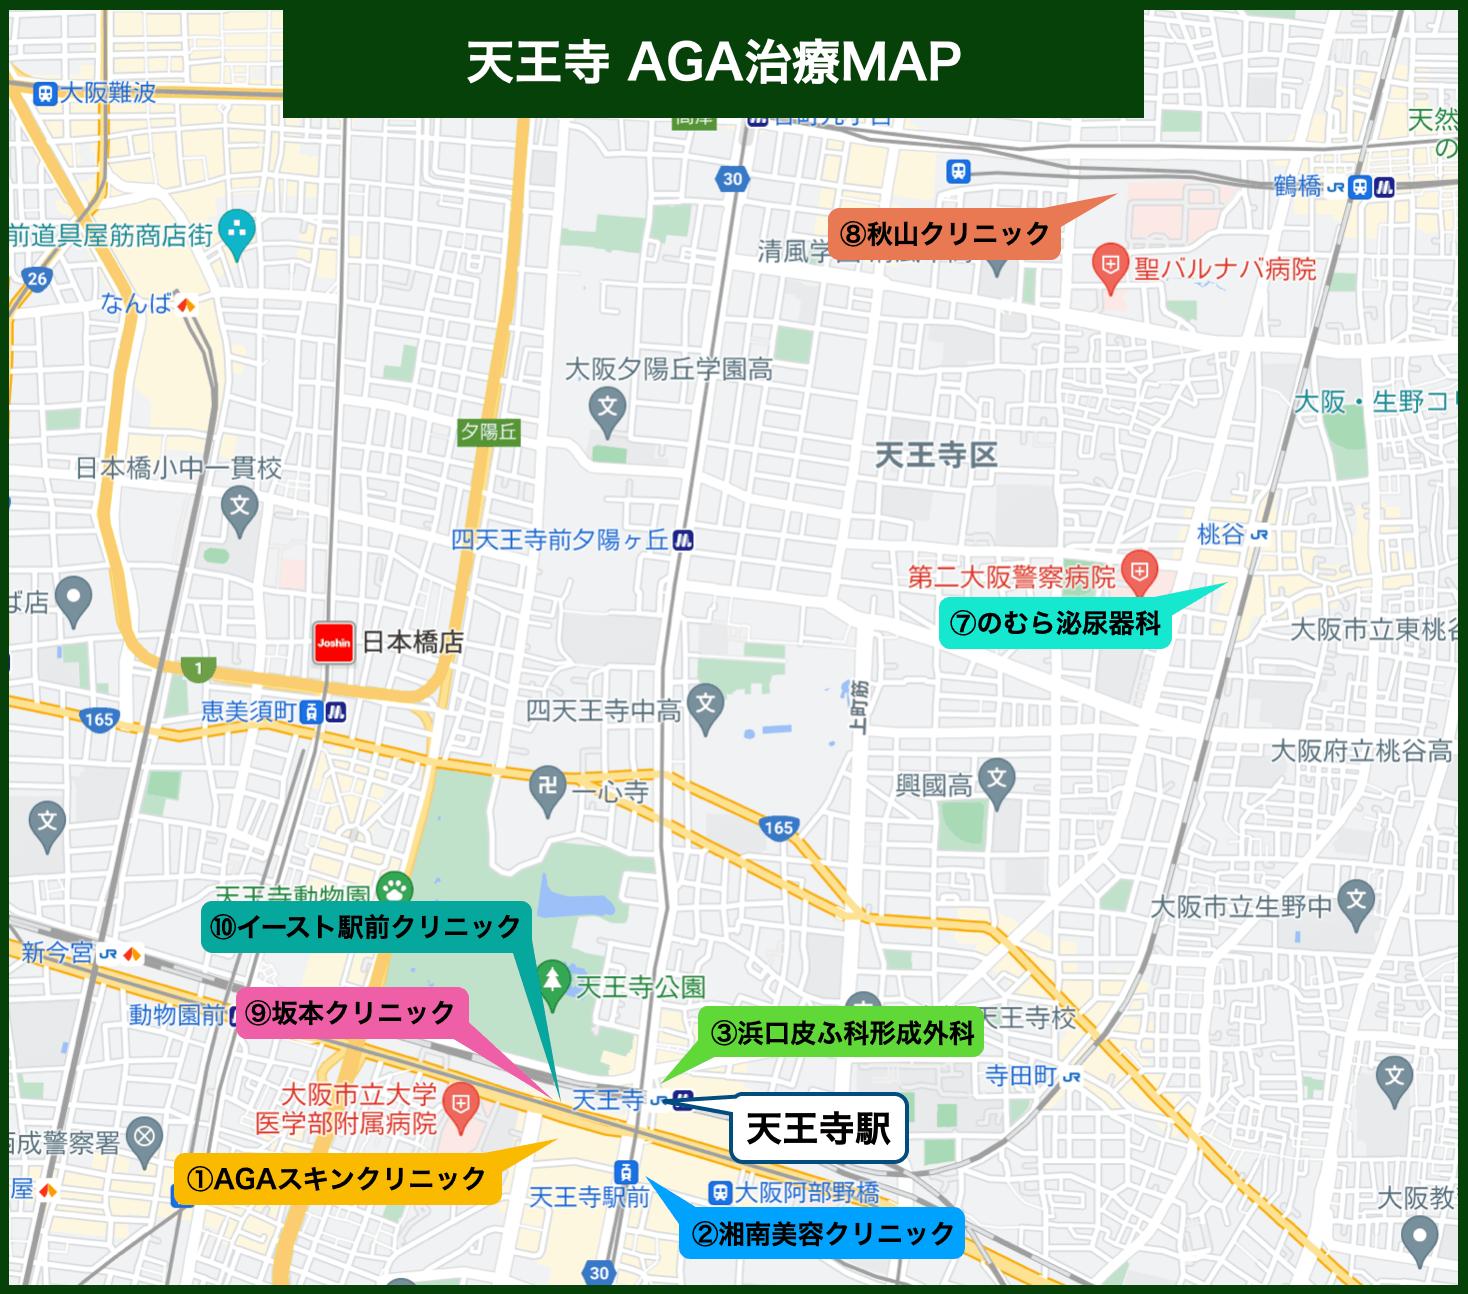 天王寺 AGA治療MAP